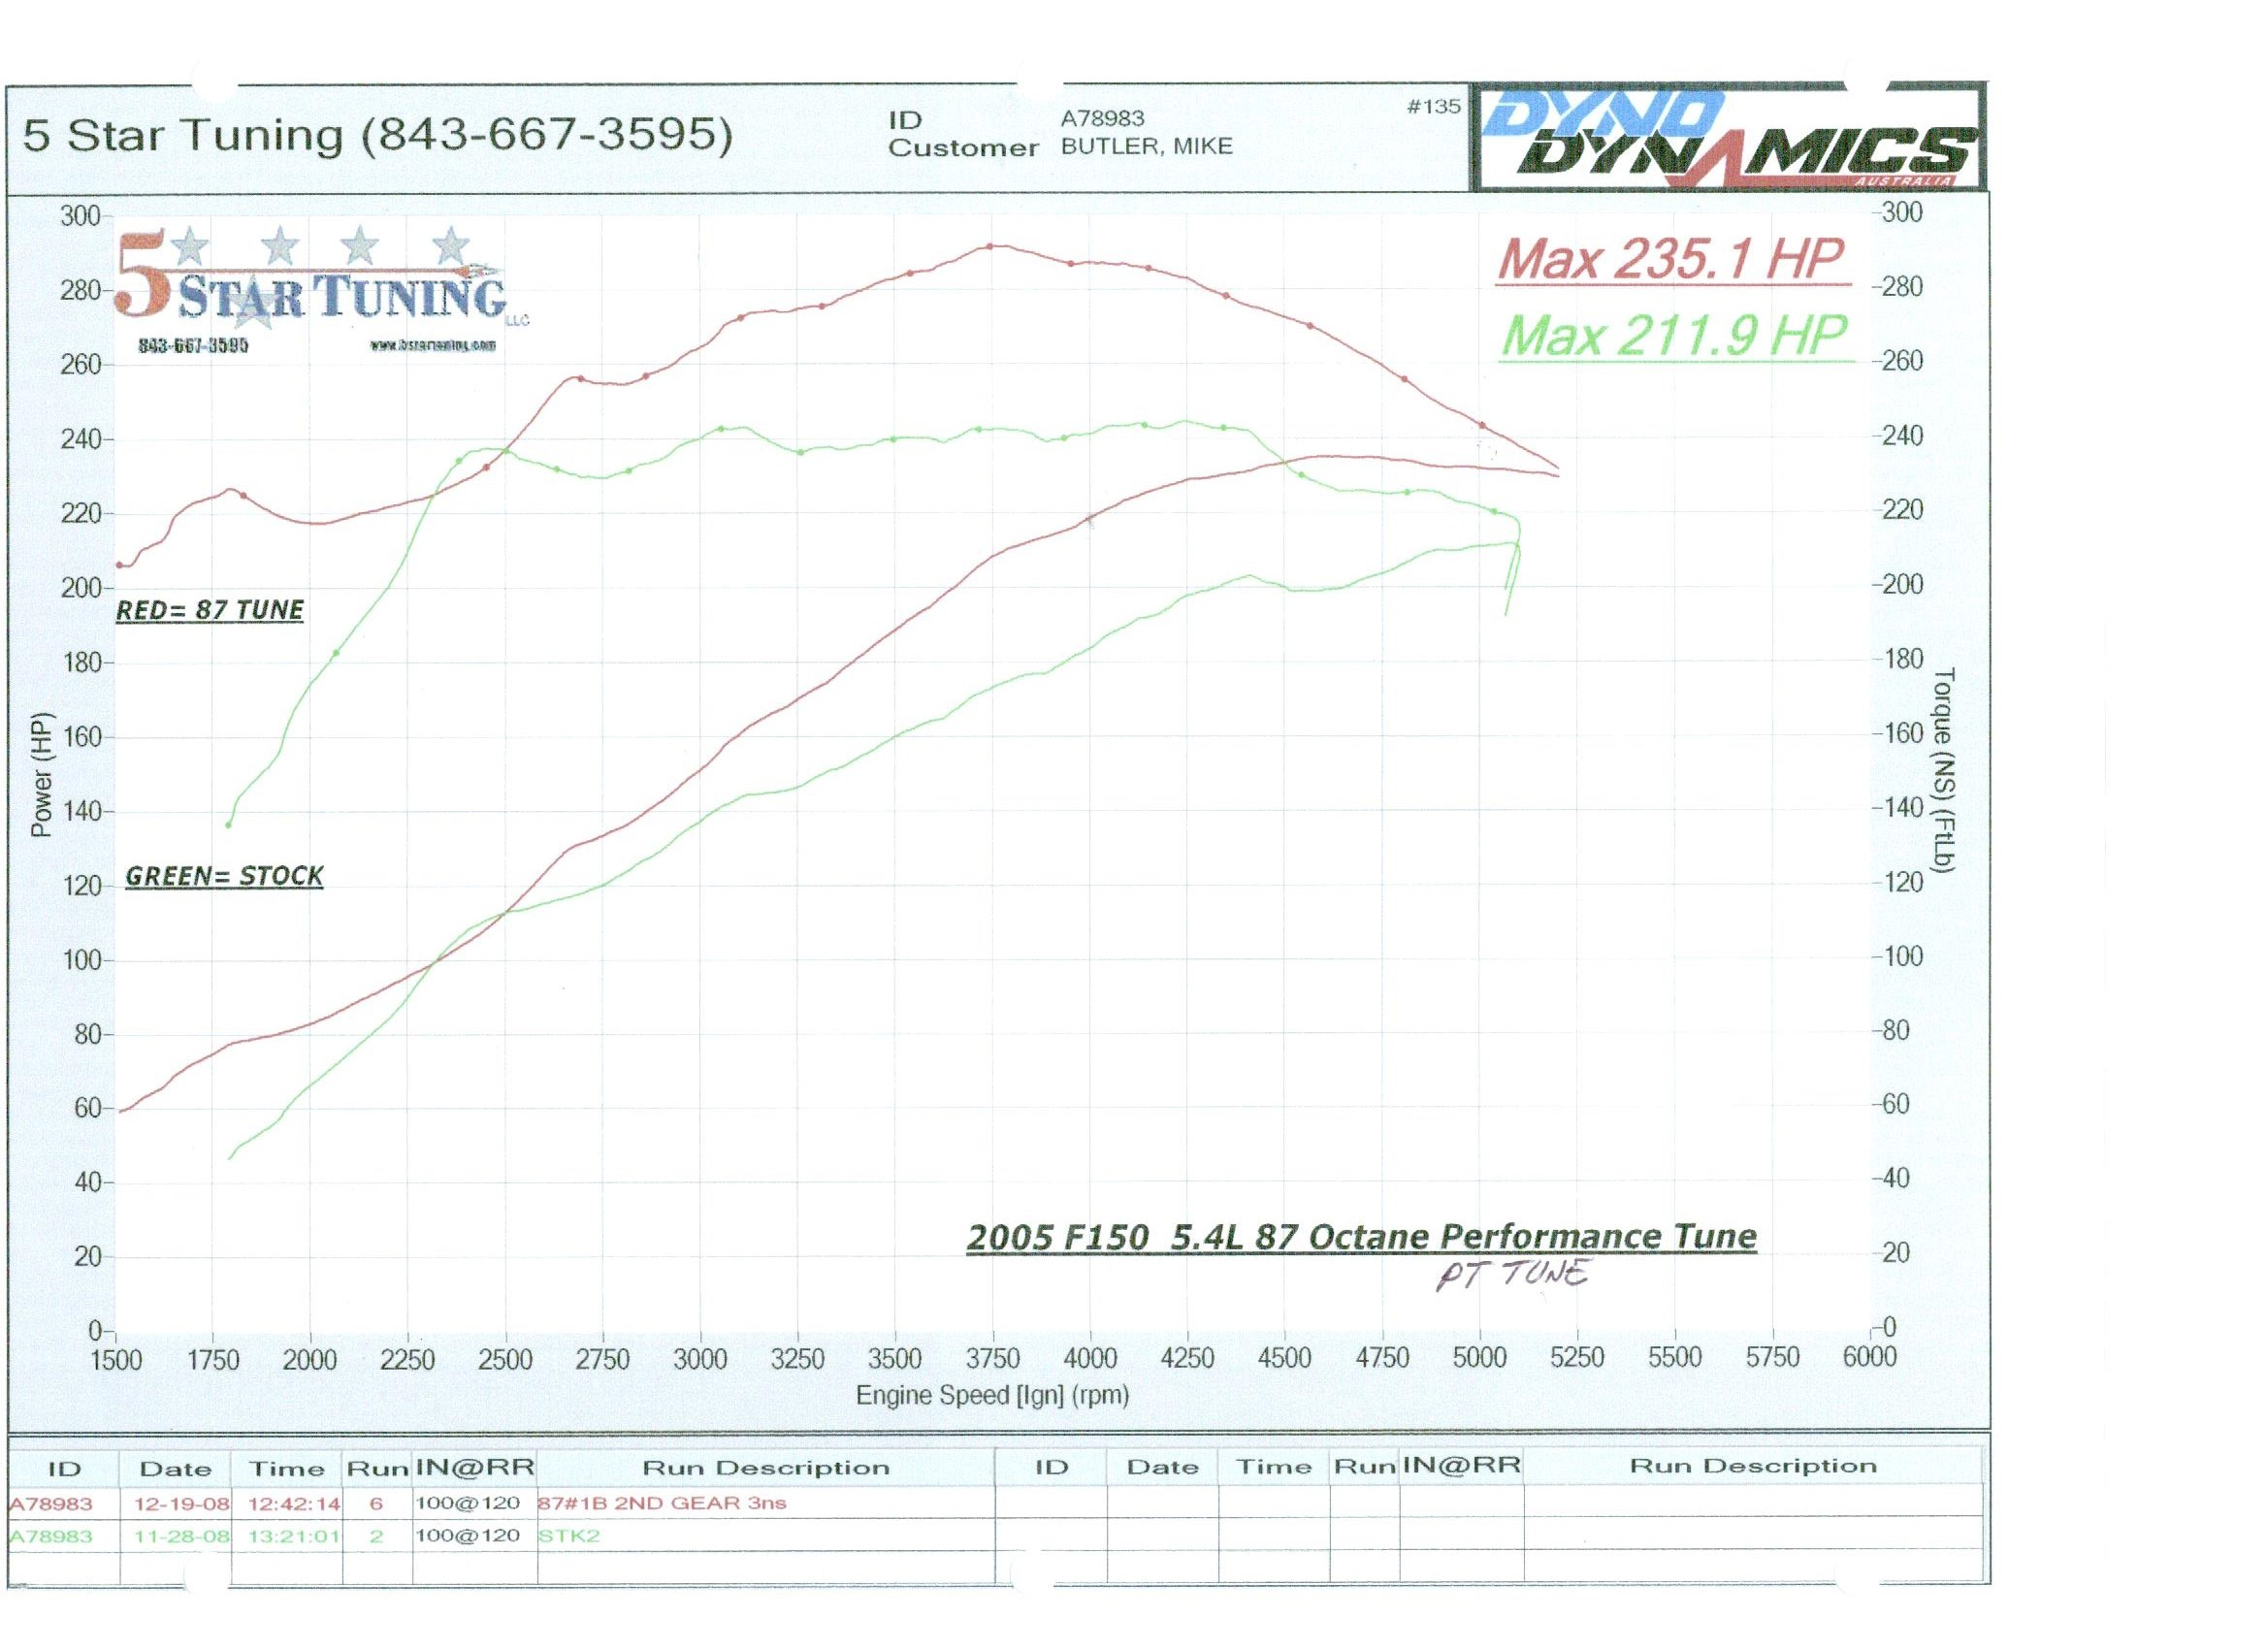 2004 ford F150 4 6 Engine Diagram Got A 5 4l V8 5 Star Tuning Of 2004 ford F150 4 6 Engine Diagram